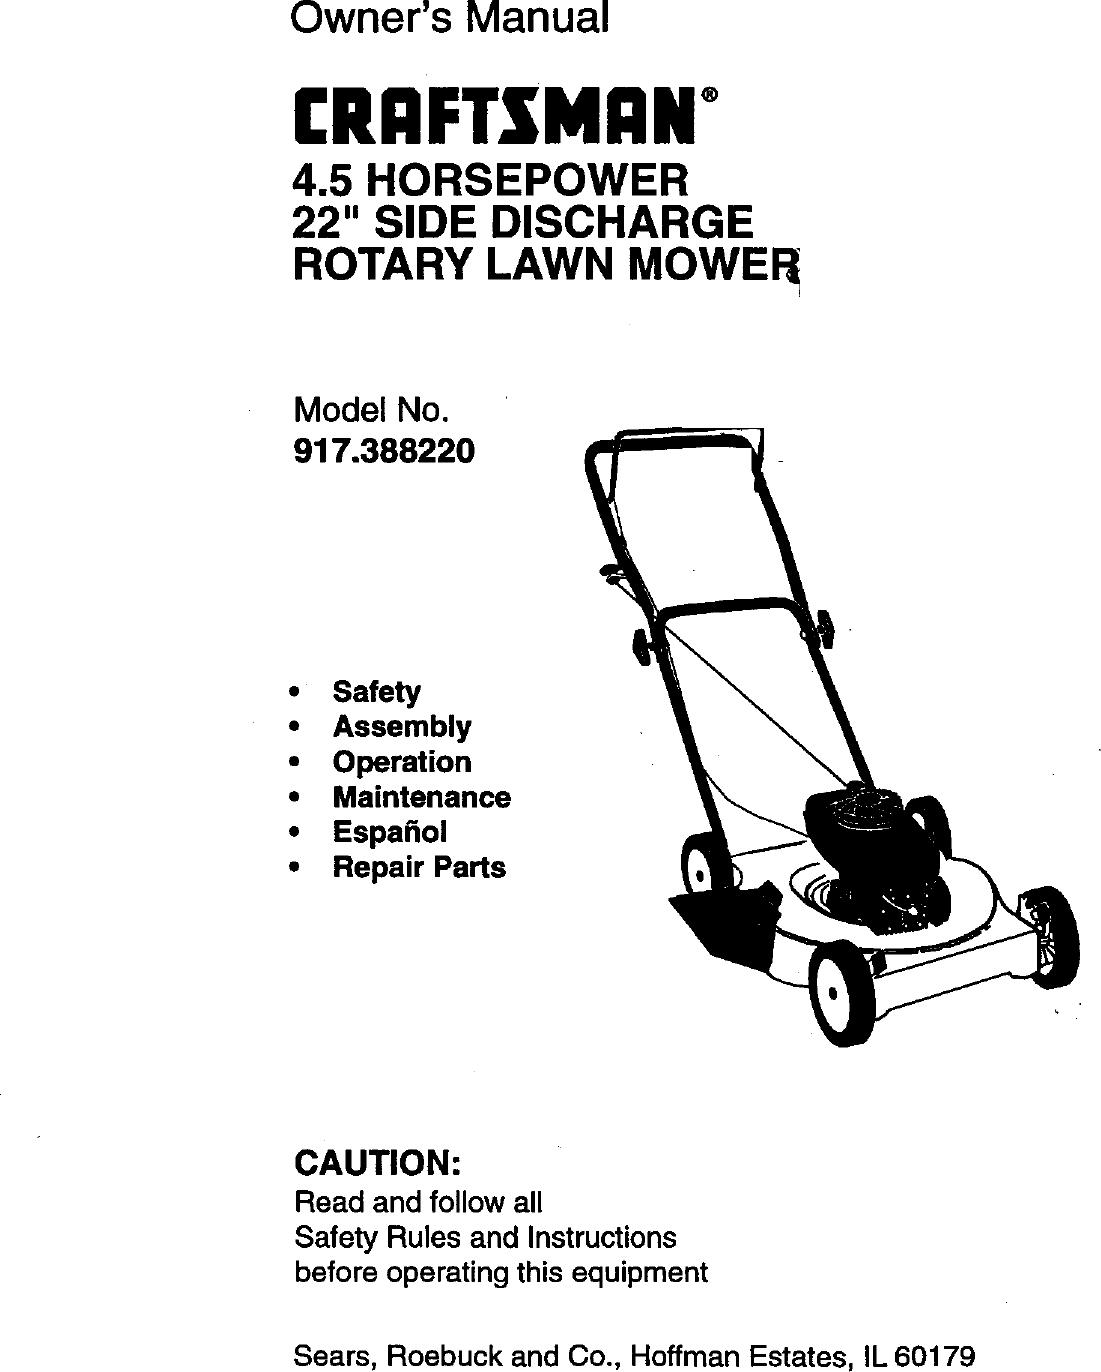 Craftsman 917388220 User Manual 4.5HP 22 ROTARY LAWN MOWER